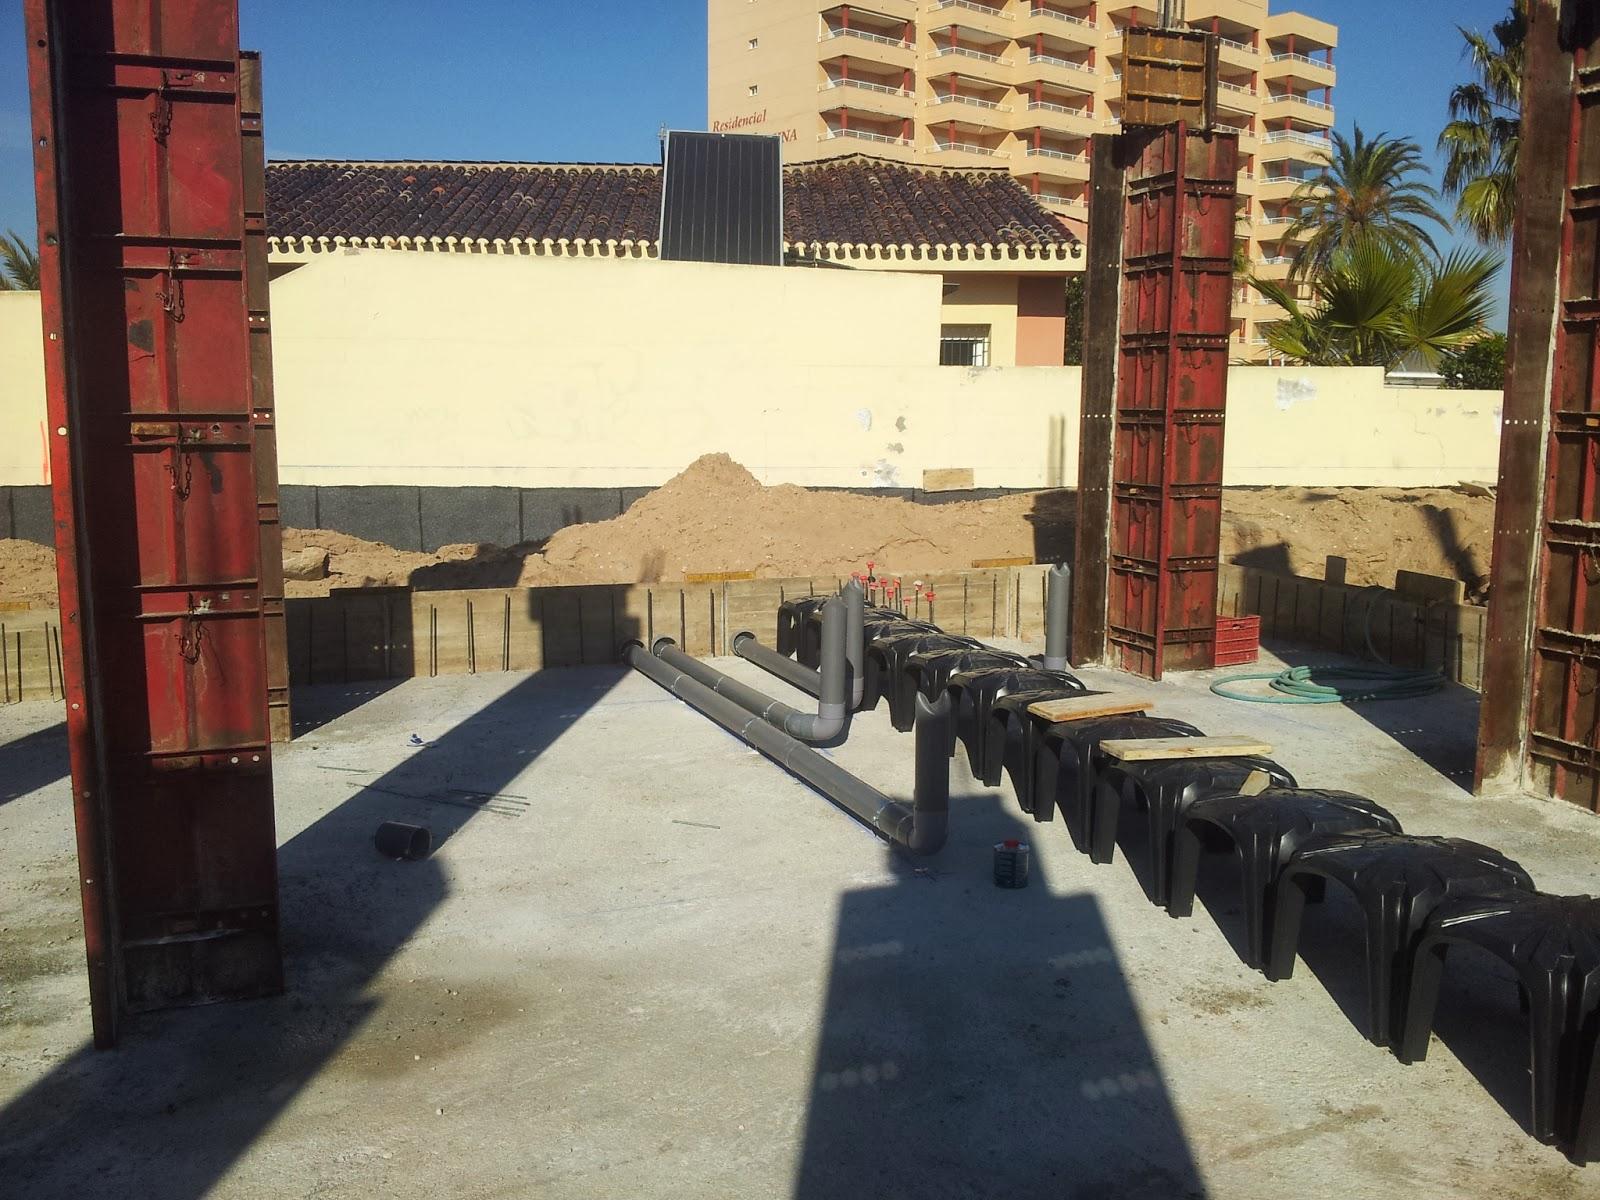 Fggd arquitectura proyectos villa gawy - Forjado sanitario caviti ...